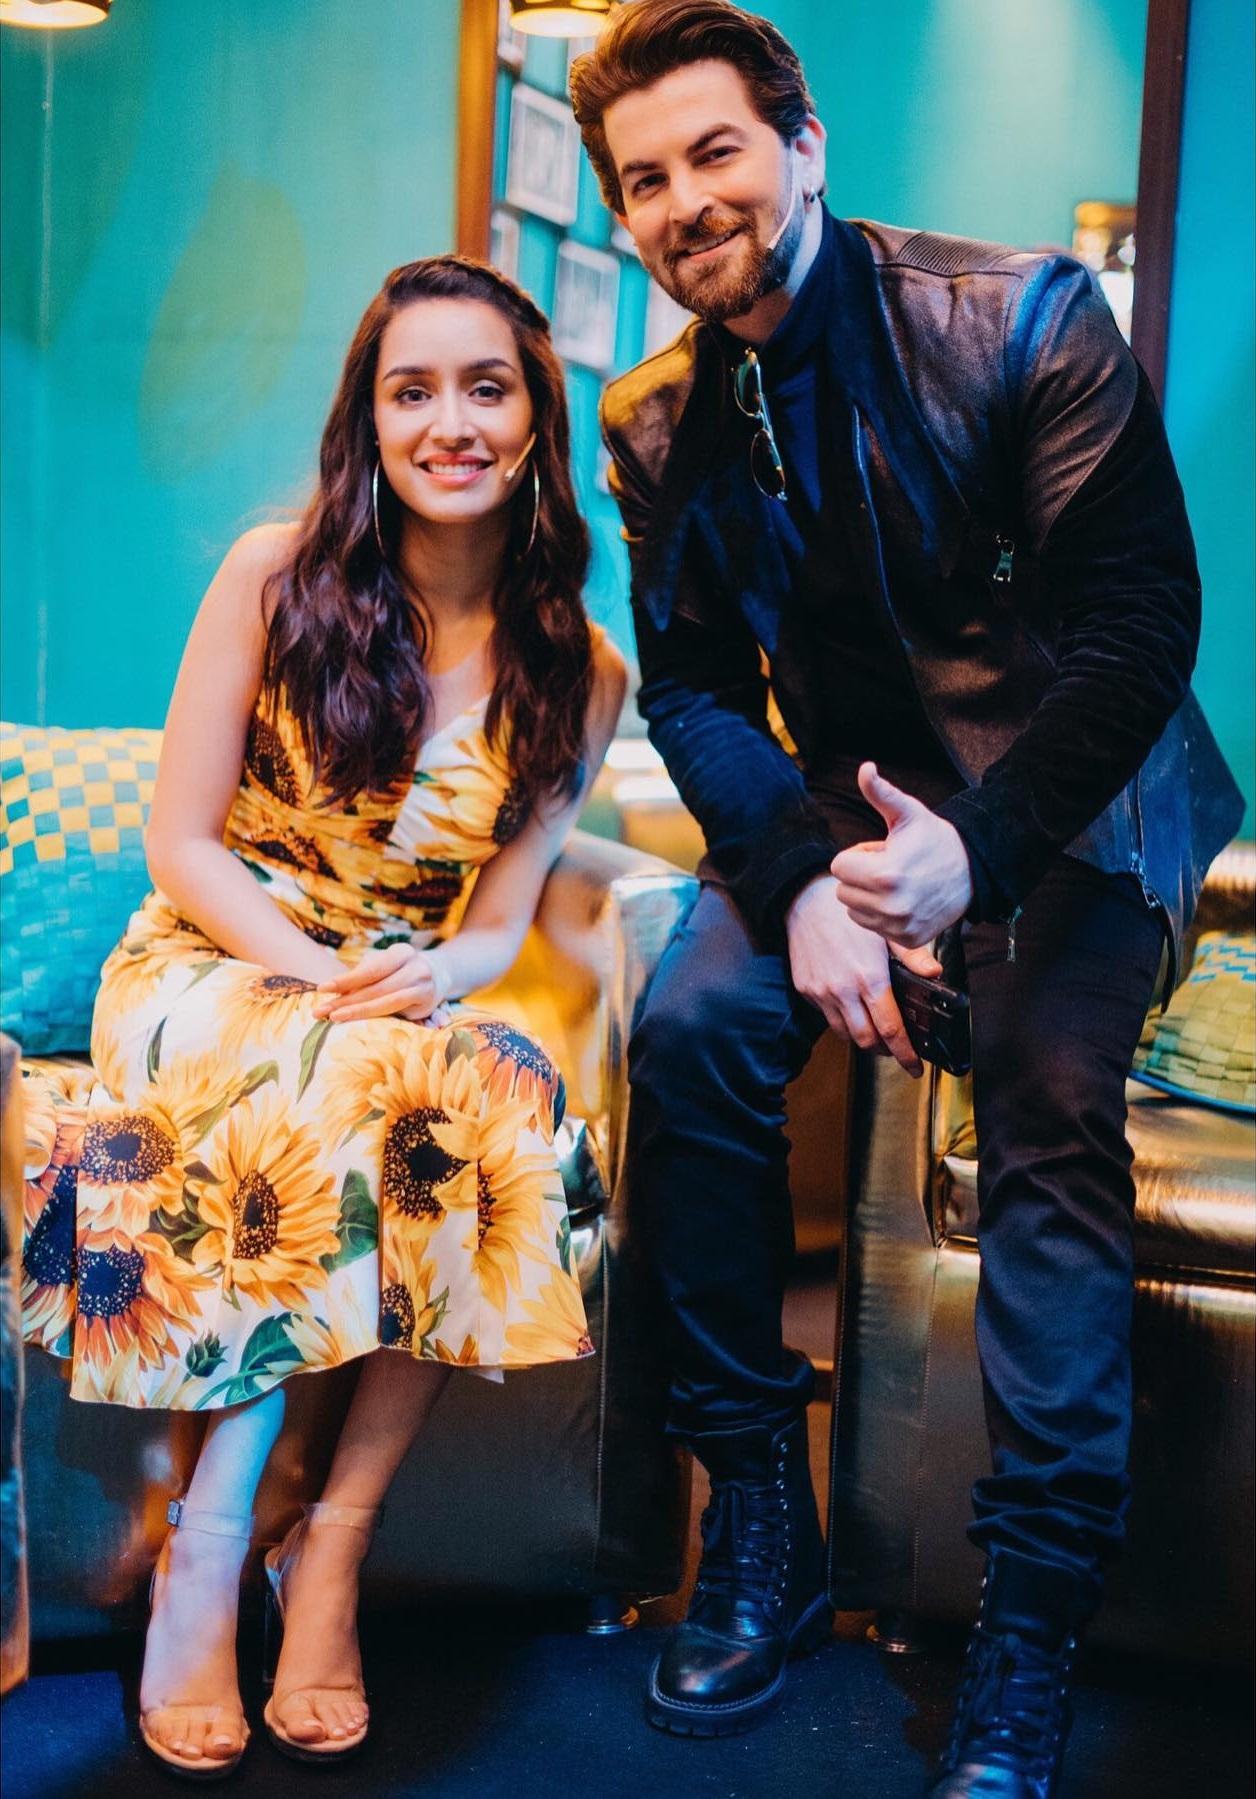 Neil Nitin Mukesh and Shraddha Kapoor in Team Saaho (2019)